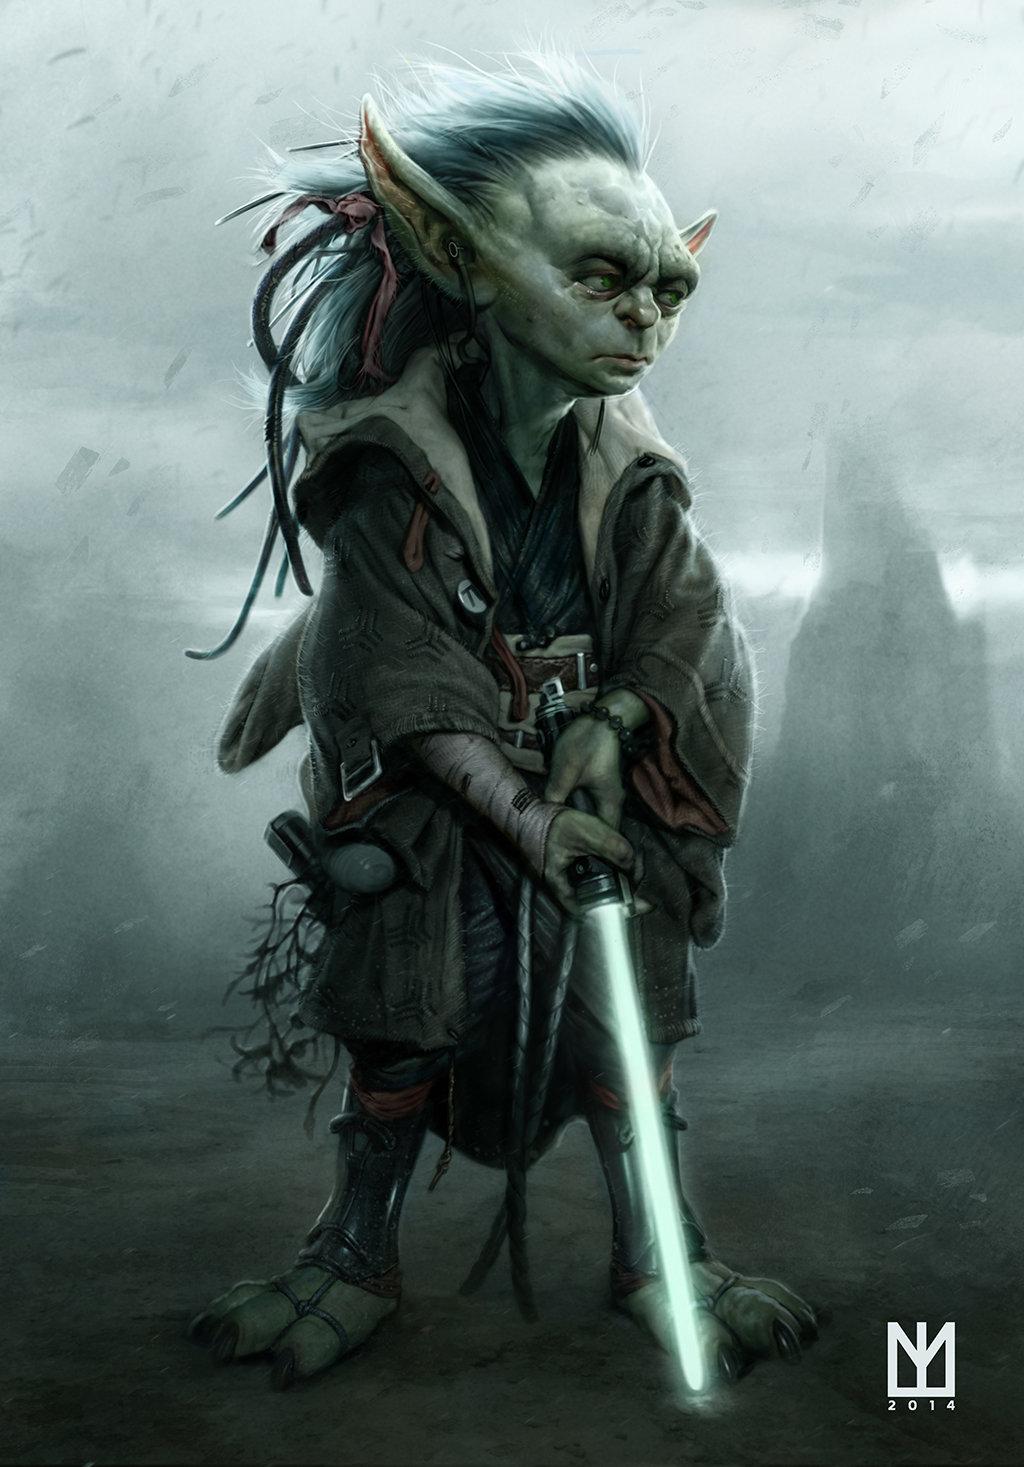 25 Illustrations et Fan arts en digital painting sur Star Wars